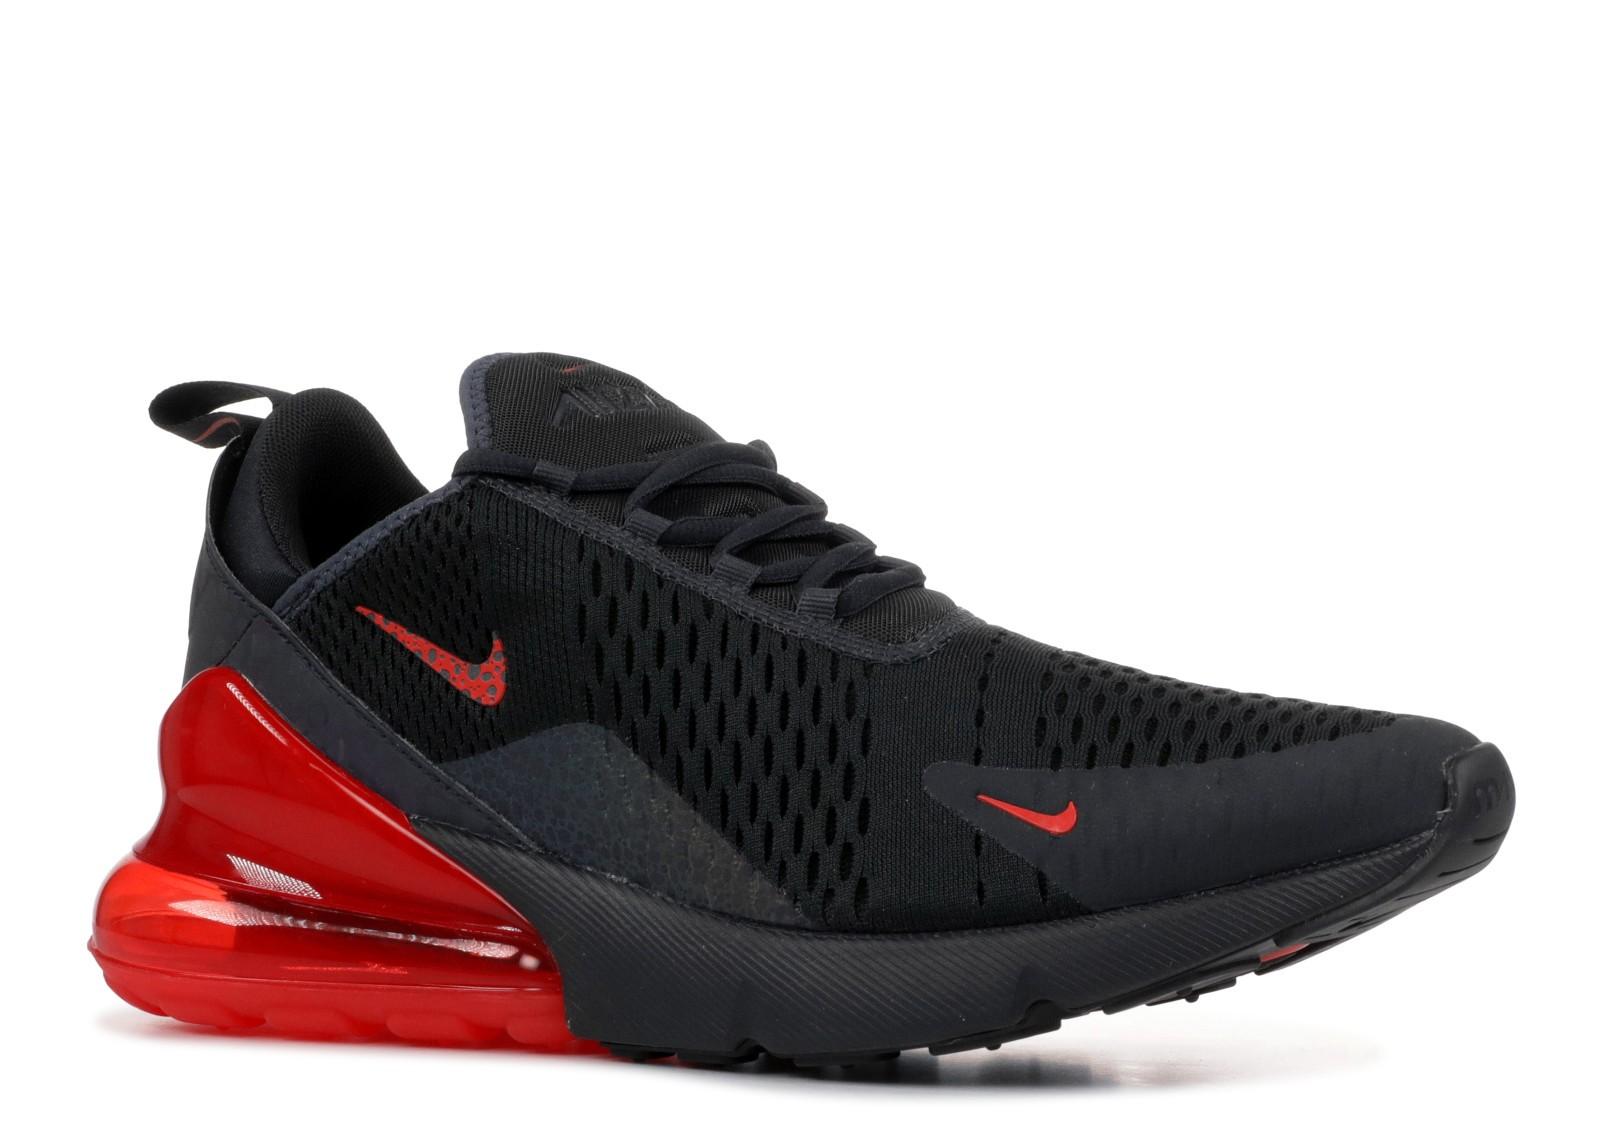 Nike Air Max 270 SE Reflective BQ6525 001 | SneakerFiles